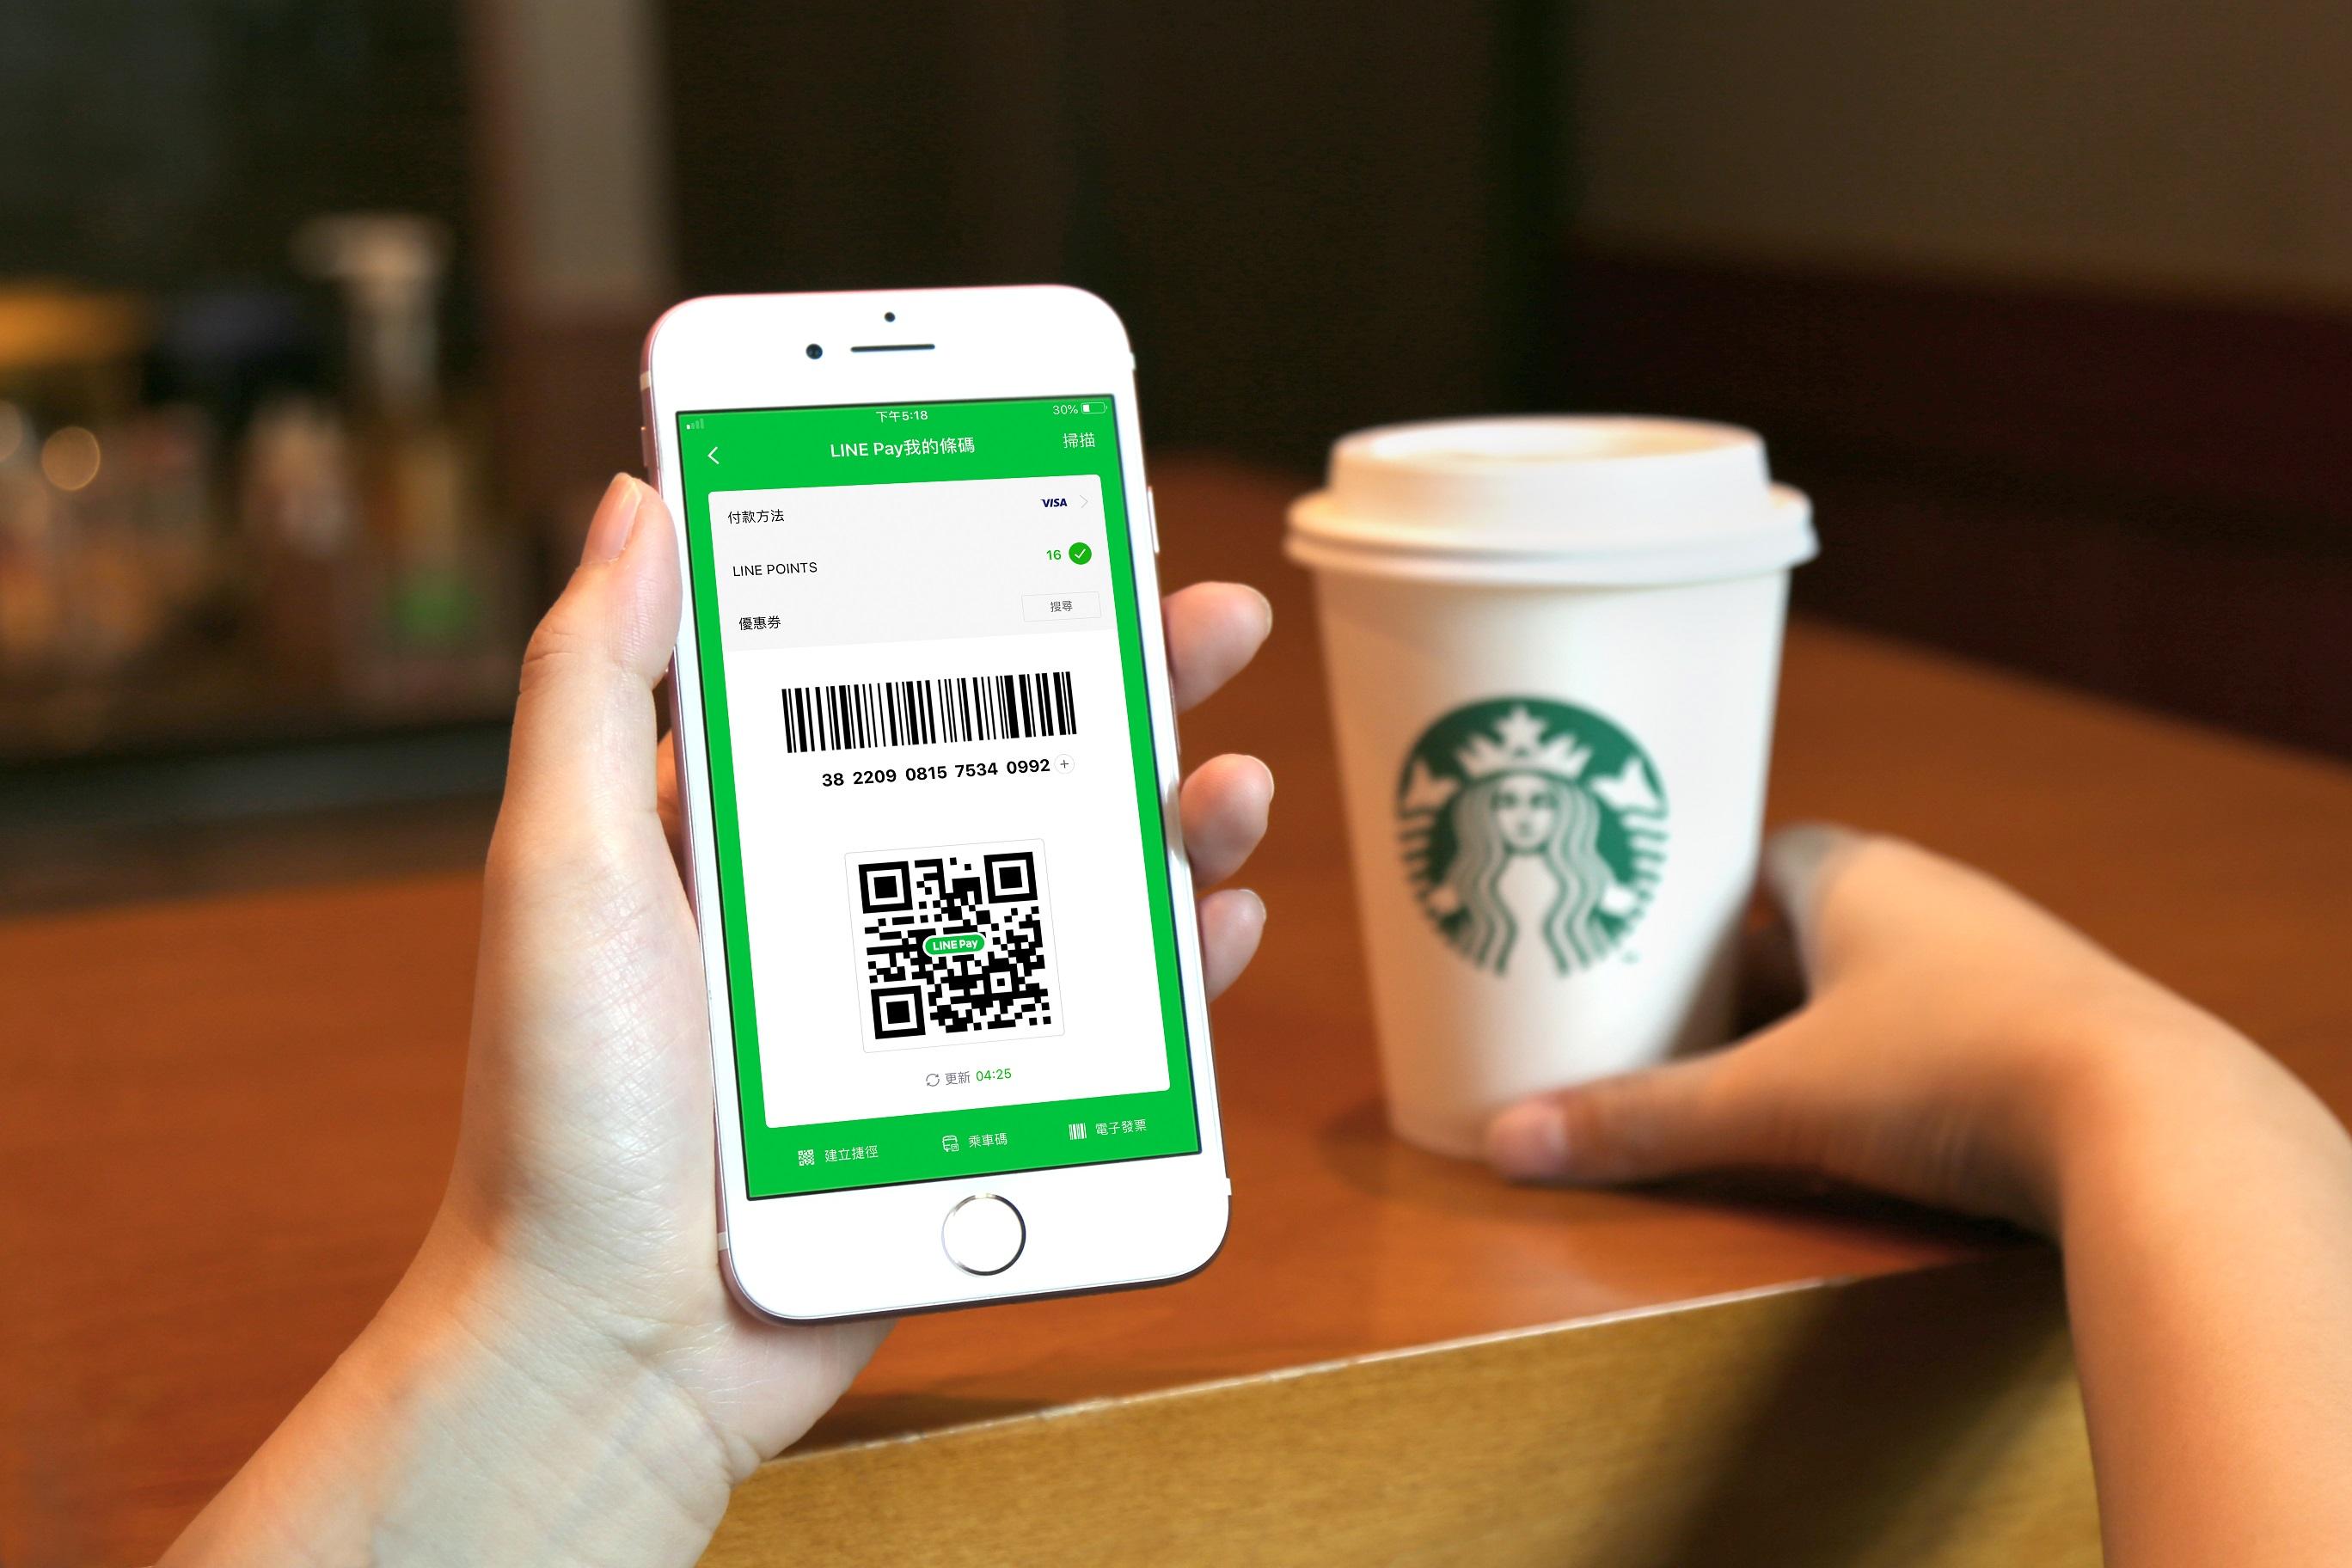 LINE Pay 攜手星巴克 即日起門市可透過 LINE Pay「我的條碼」結帳付款了! 期間限定推出上看 LINE POINTS 25%超好康回饋